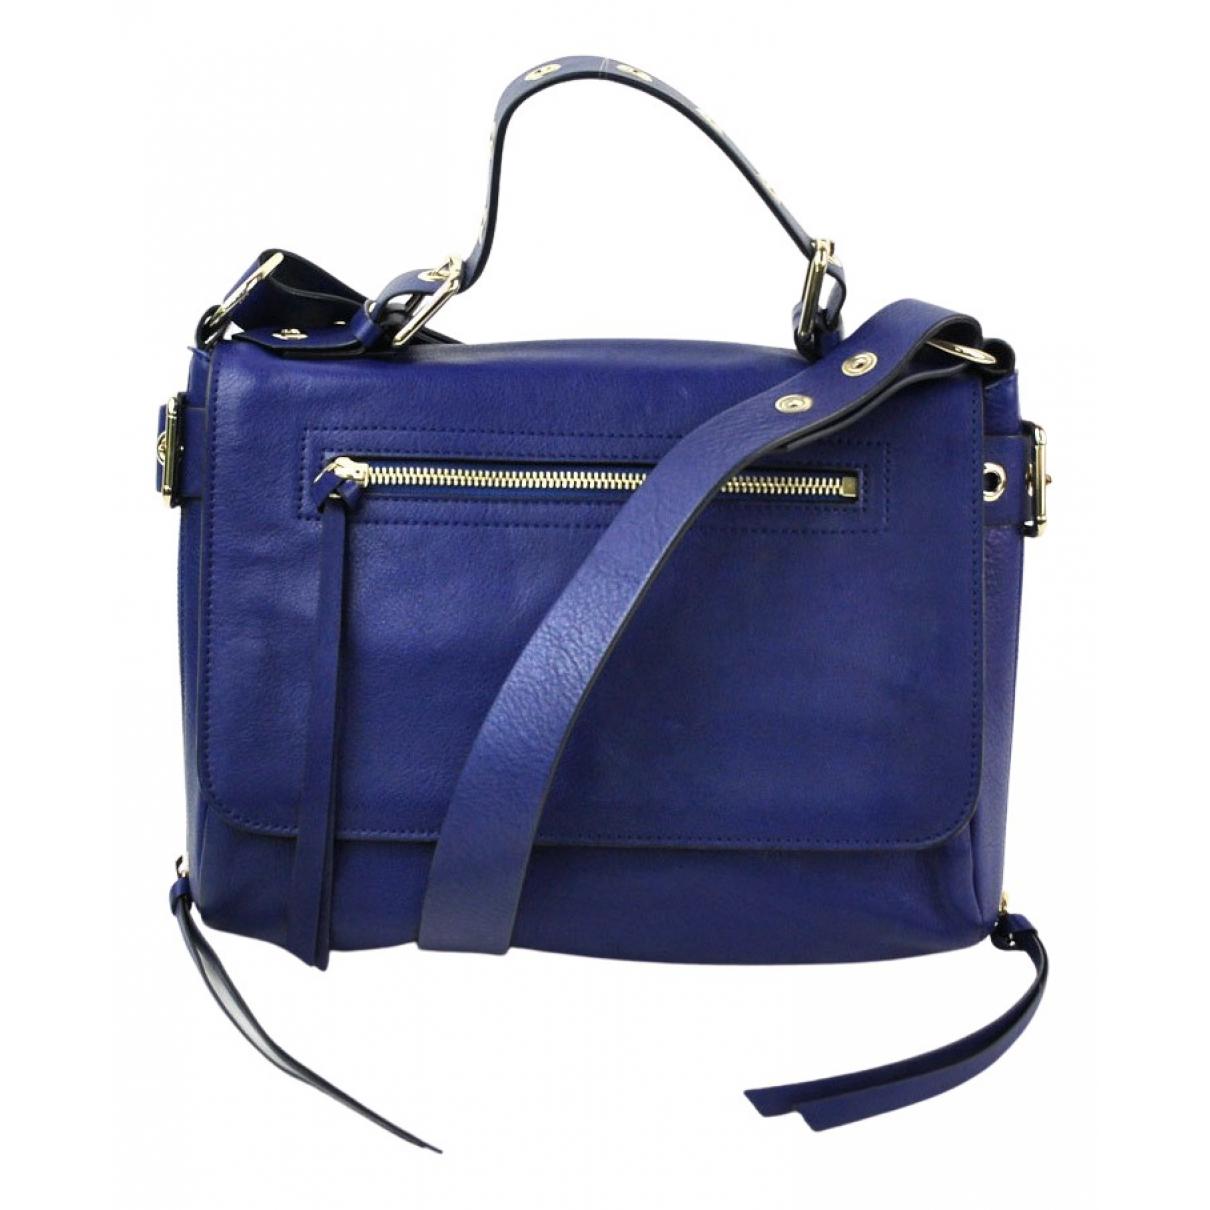 Red Valentino Garavani \N Blue Leather handbag for Women \N